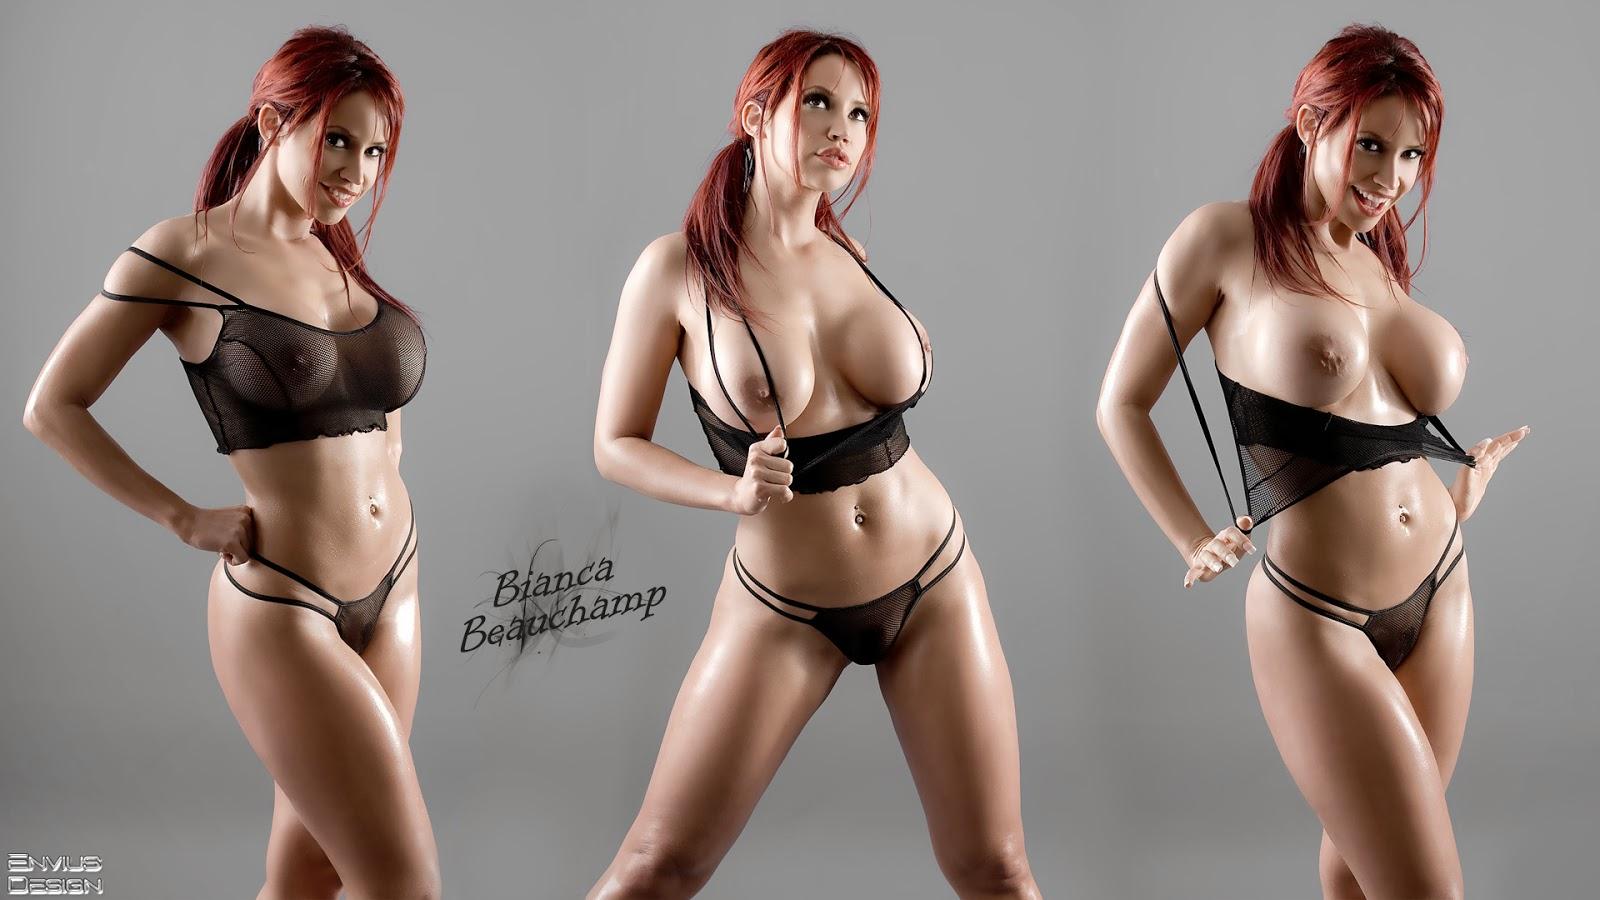 Bianca Beauchamp Erotic Red Head Wallpaper